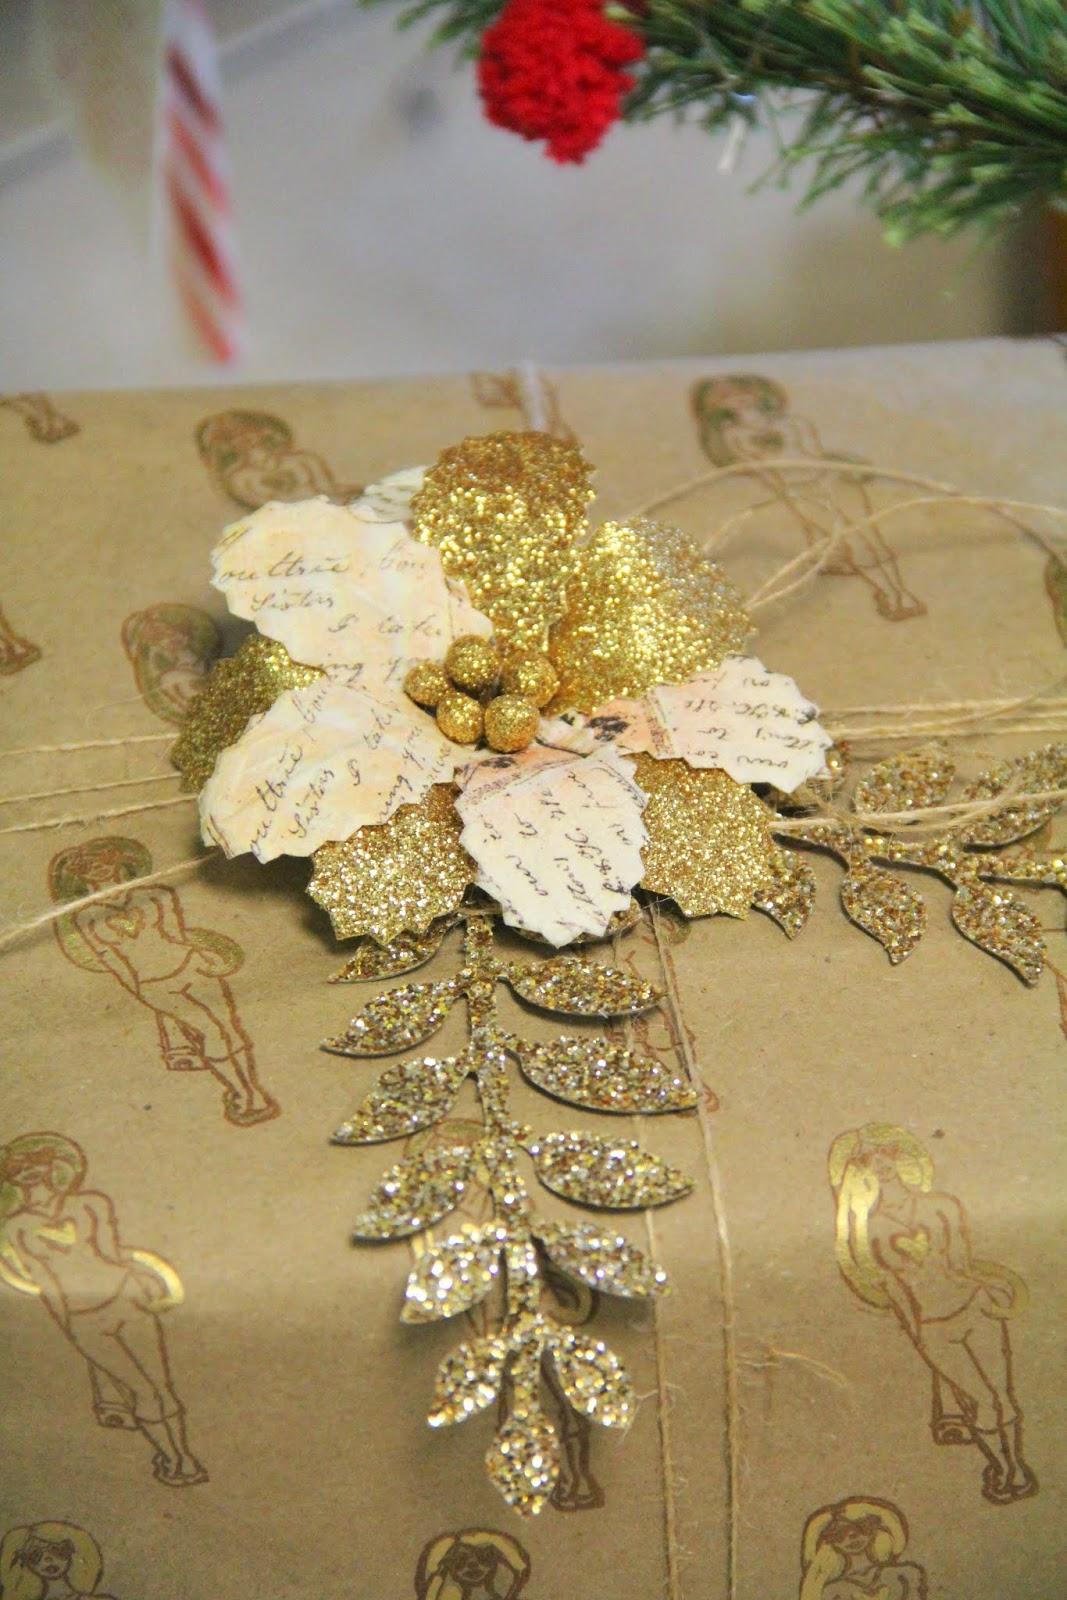 http://milagroscrivera.blogspot.com/2014/12/merry-christmas.html